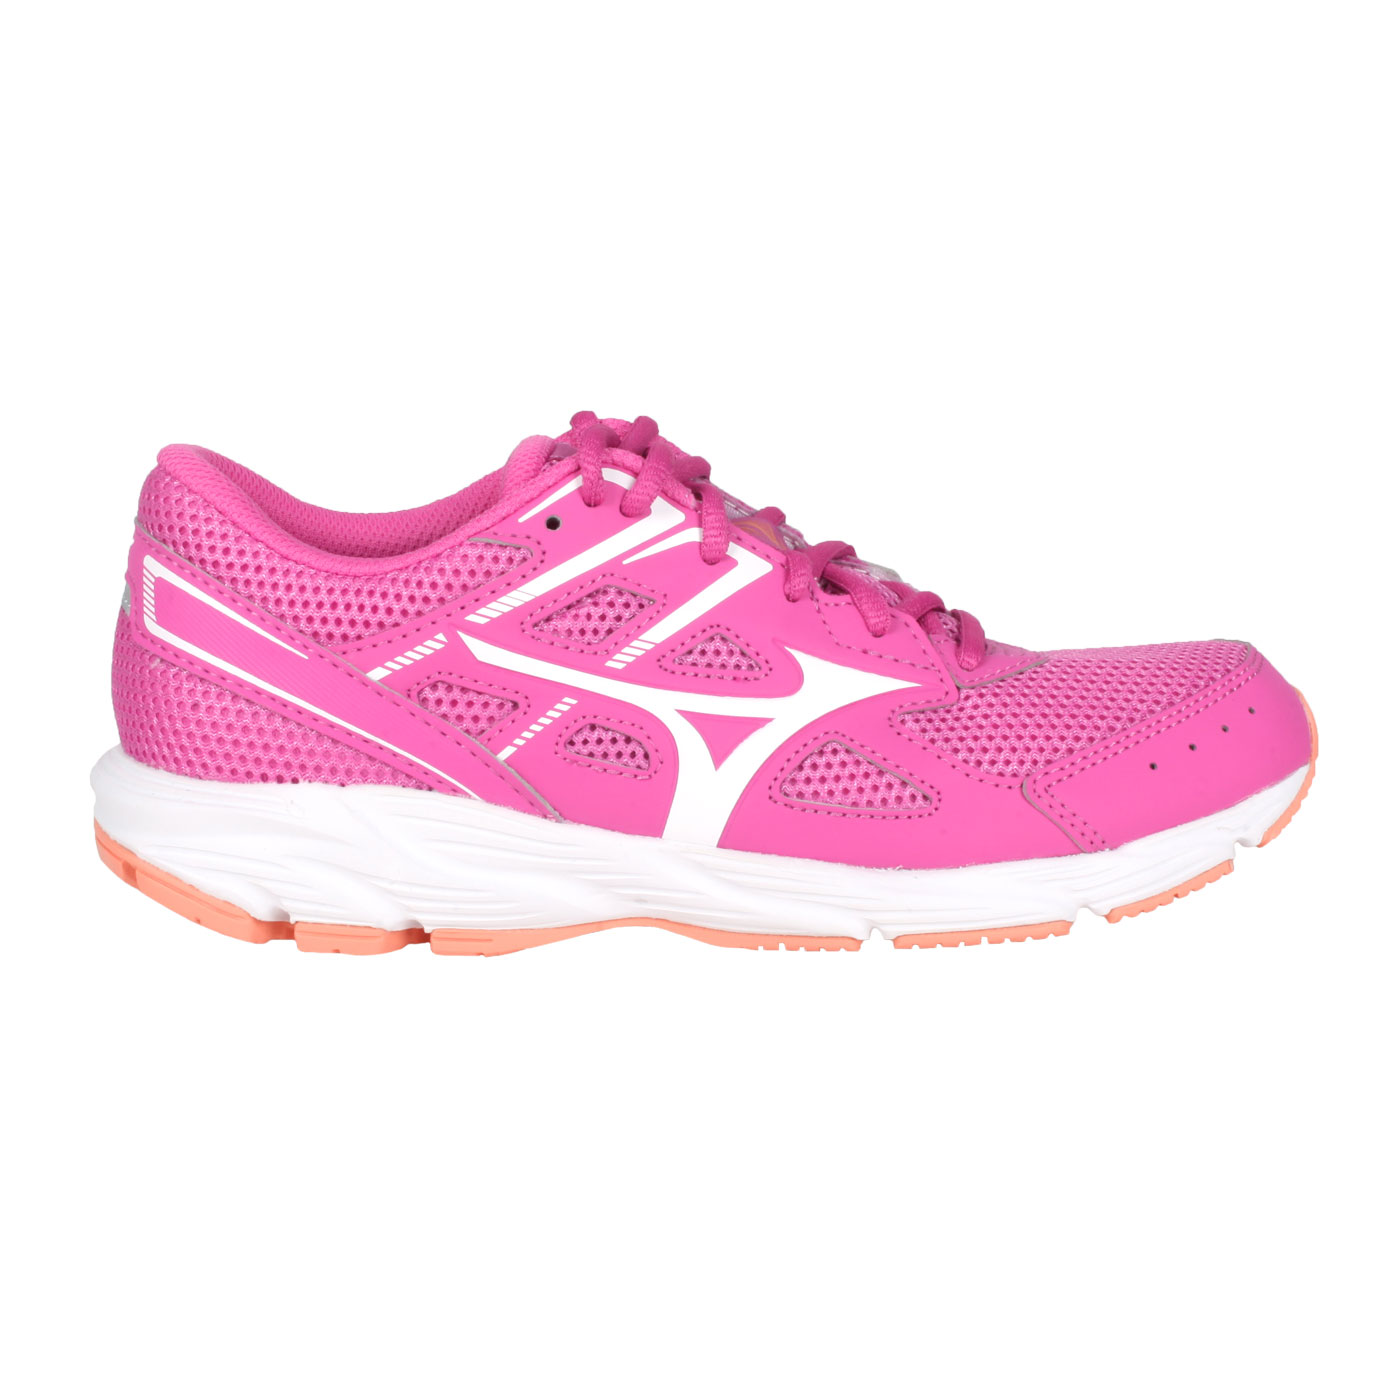 MIZUNO 女款慢跑鞋  @ SPARK 6@K1GA210403 - 桃紅白橘